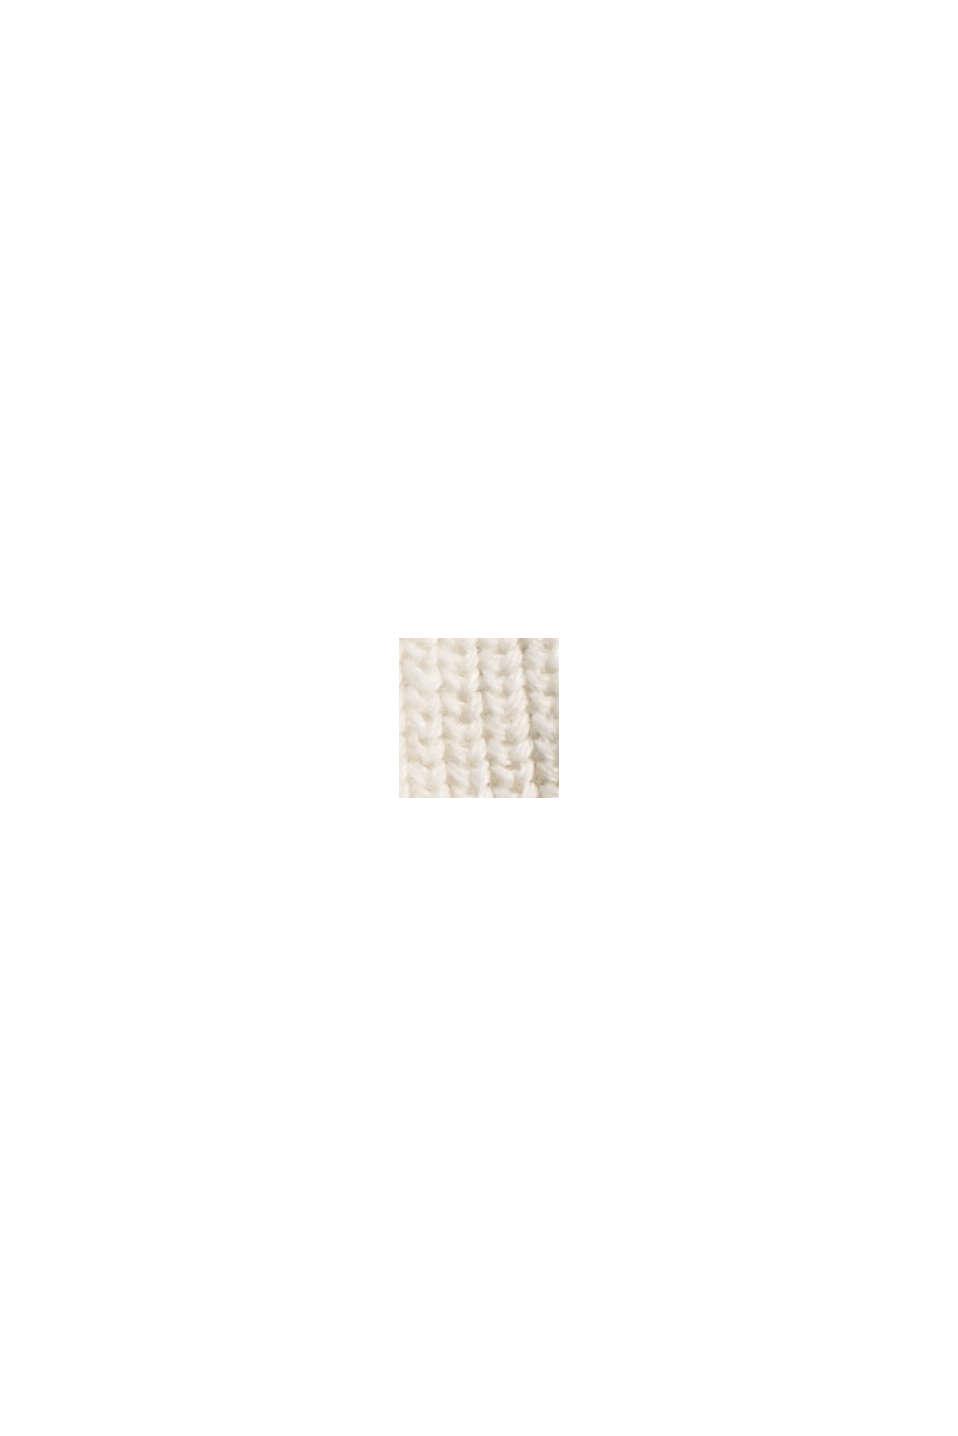 Pullover dolcevita in 100% cotone biologico, OFF WHITE, swatch